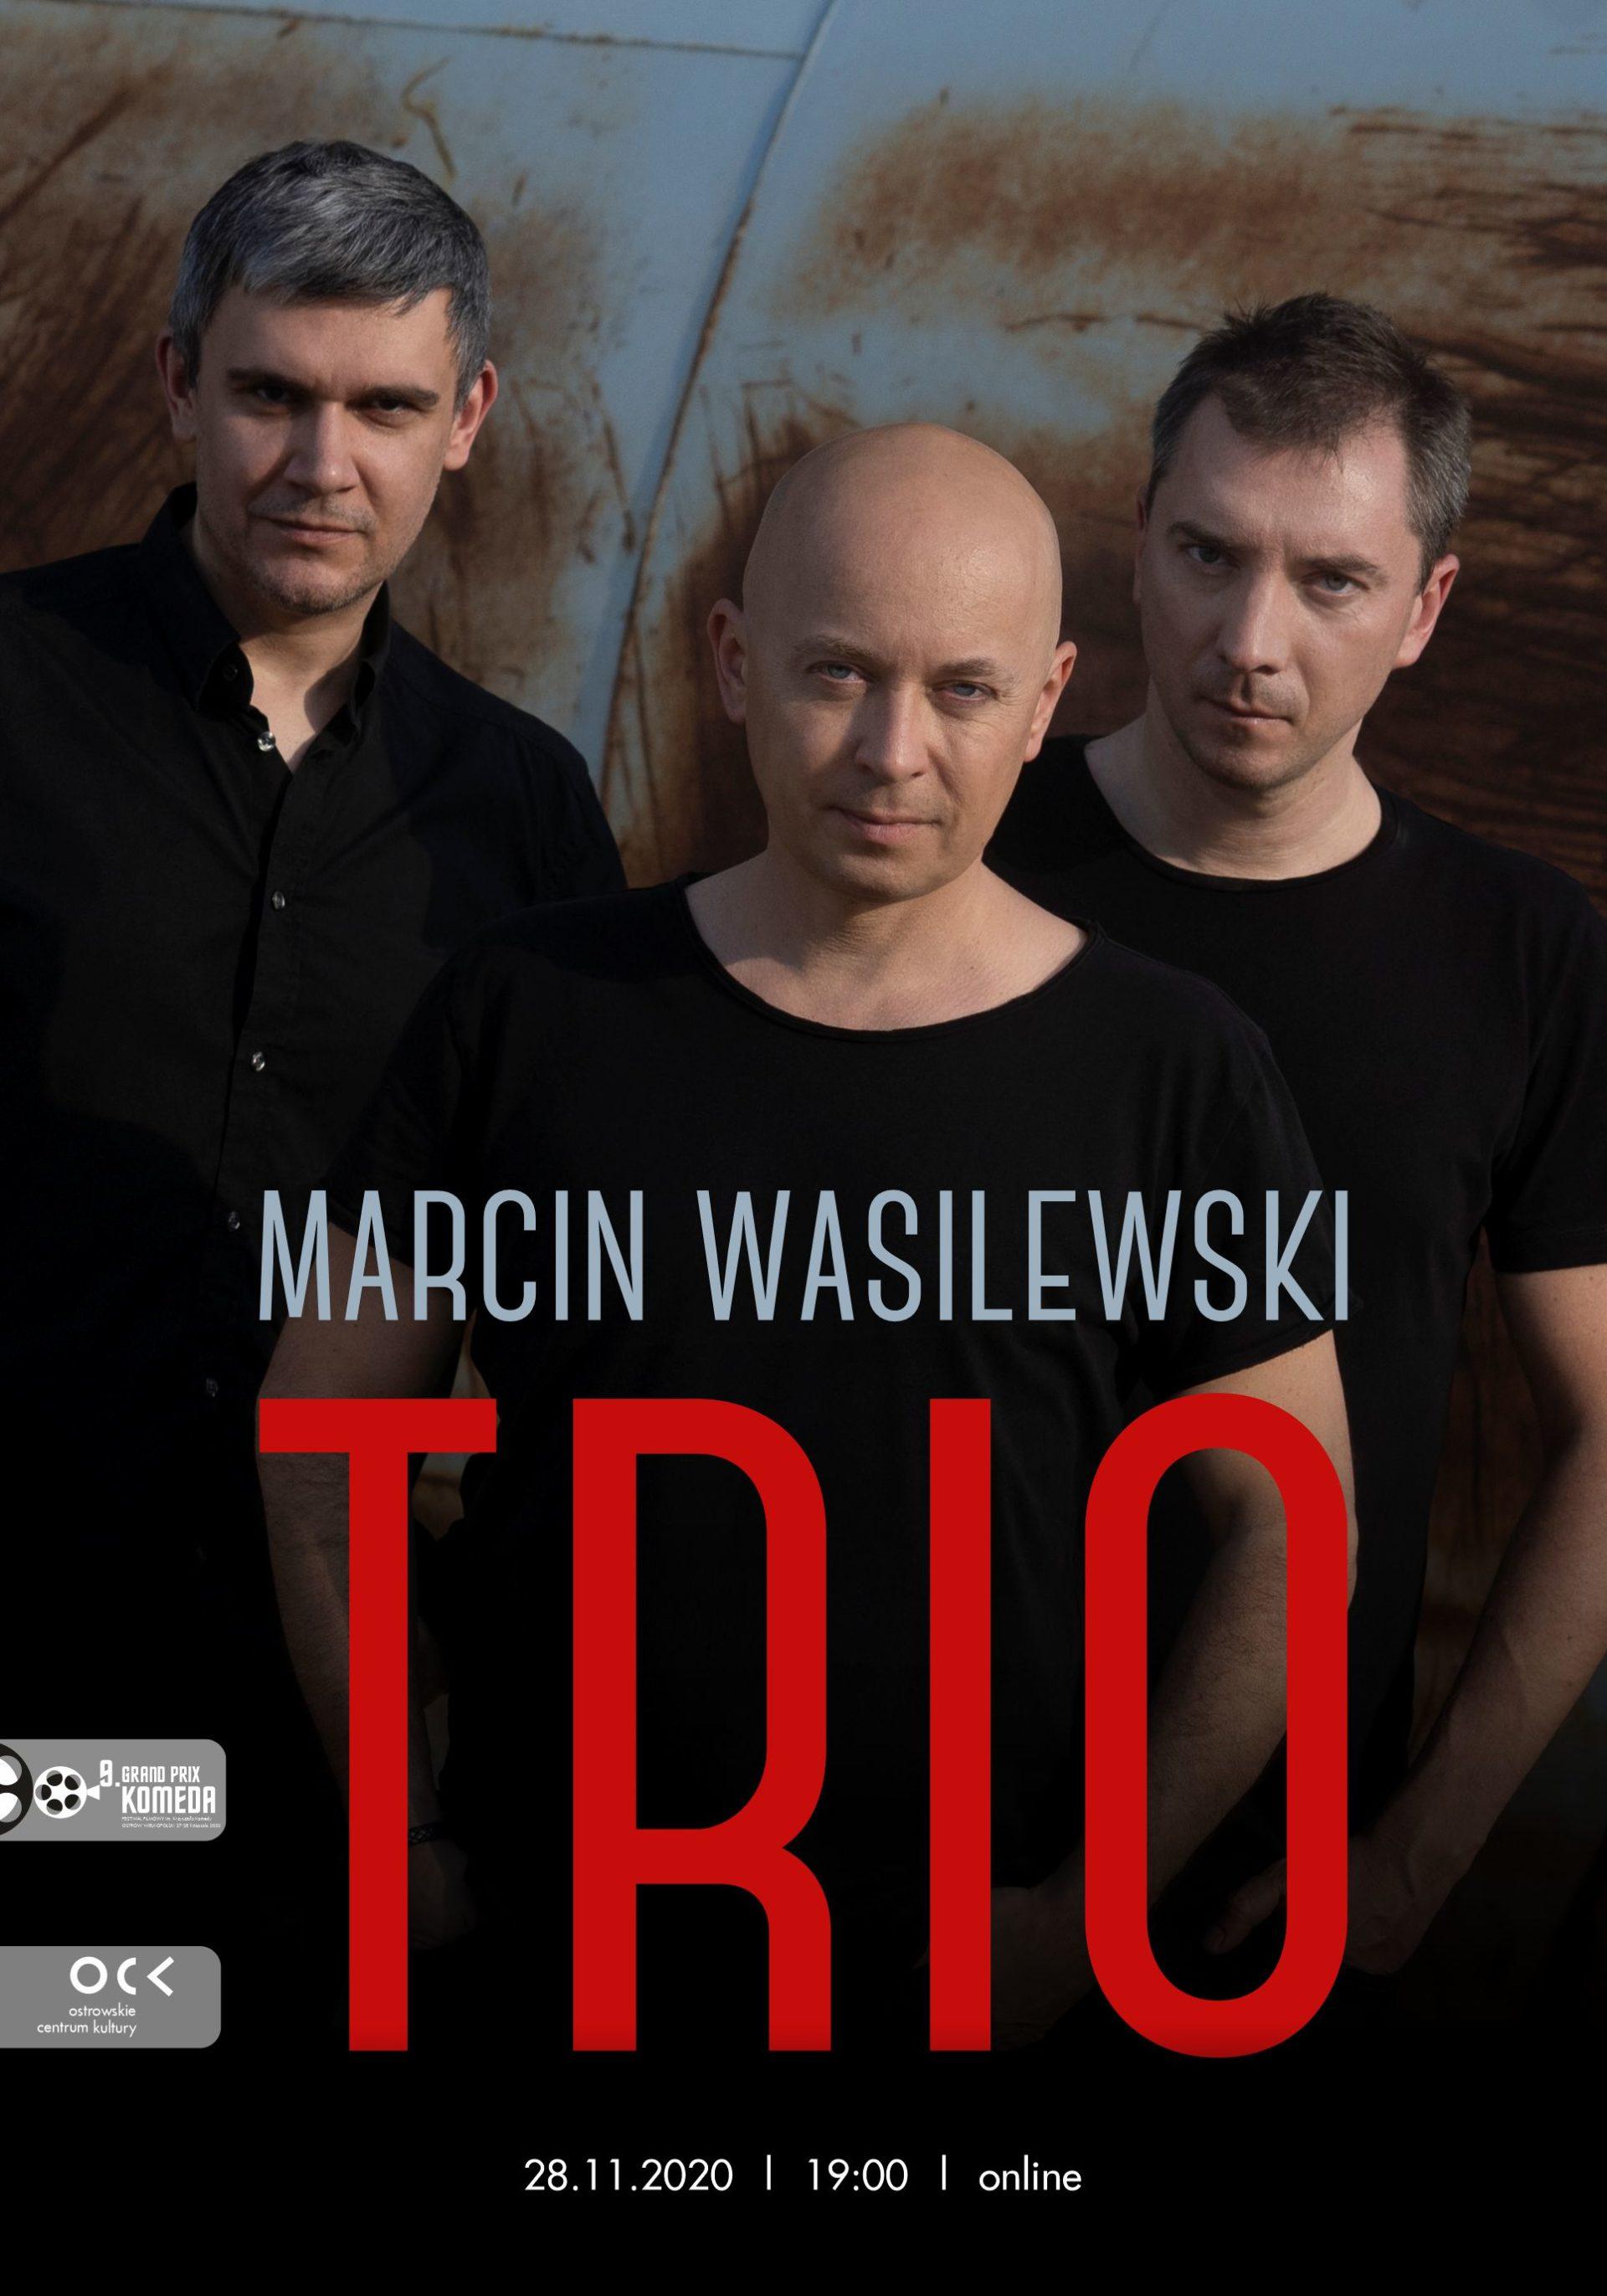 Marcin Wasilewski Trio | 9. Grand Prix Komeda | online